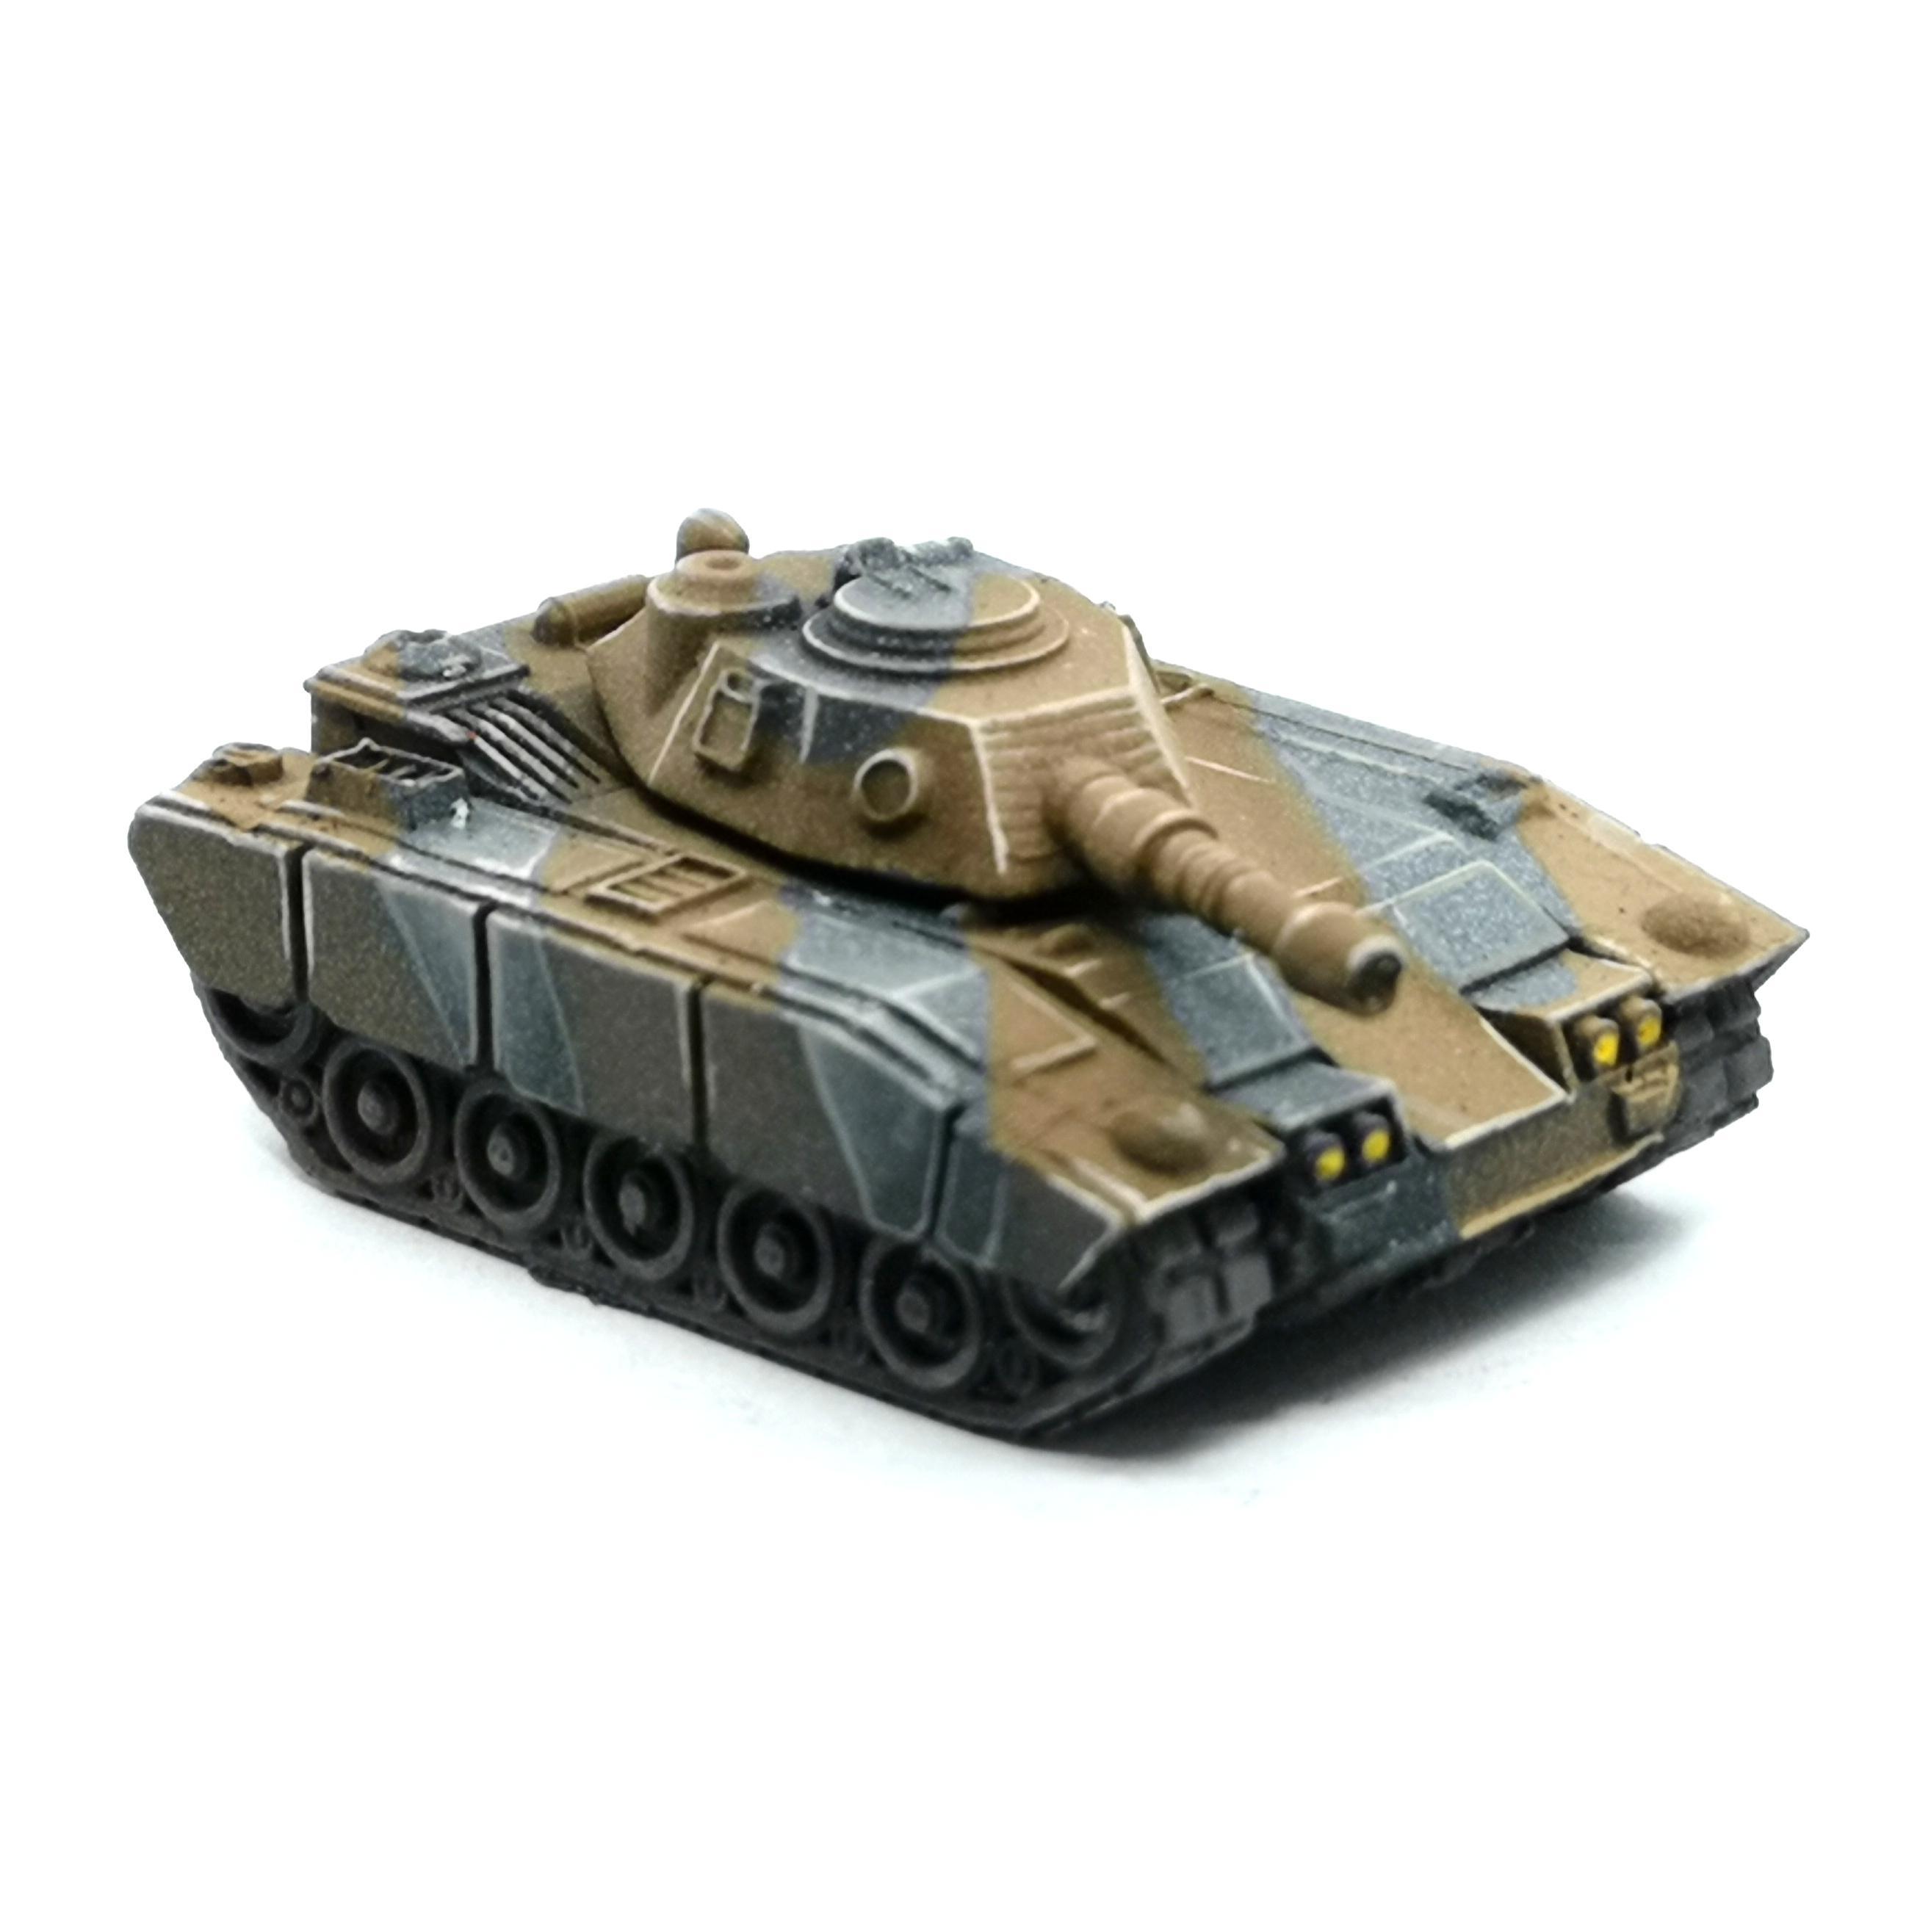 10mm, Bot War, Gi Joe, Mechs, Robots, Tank, Traders Galaxy, Transformers